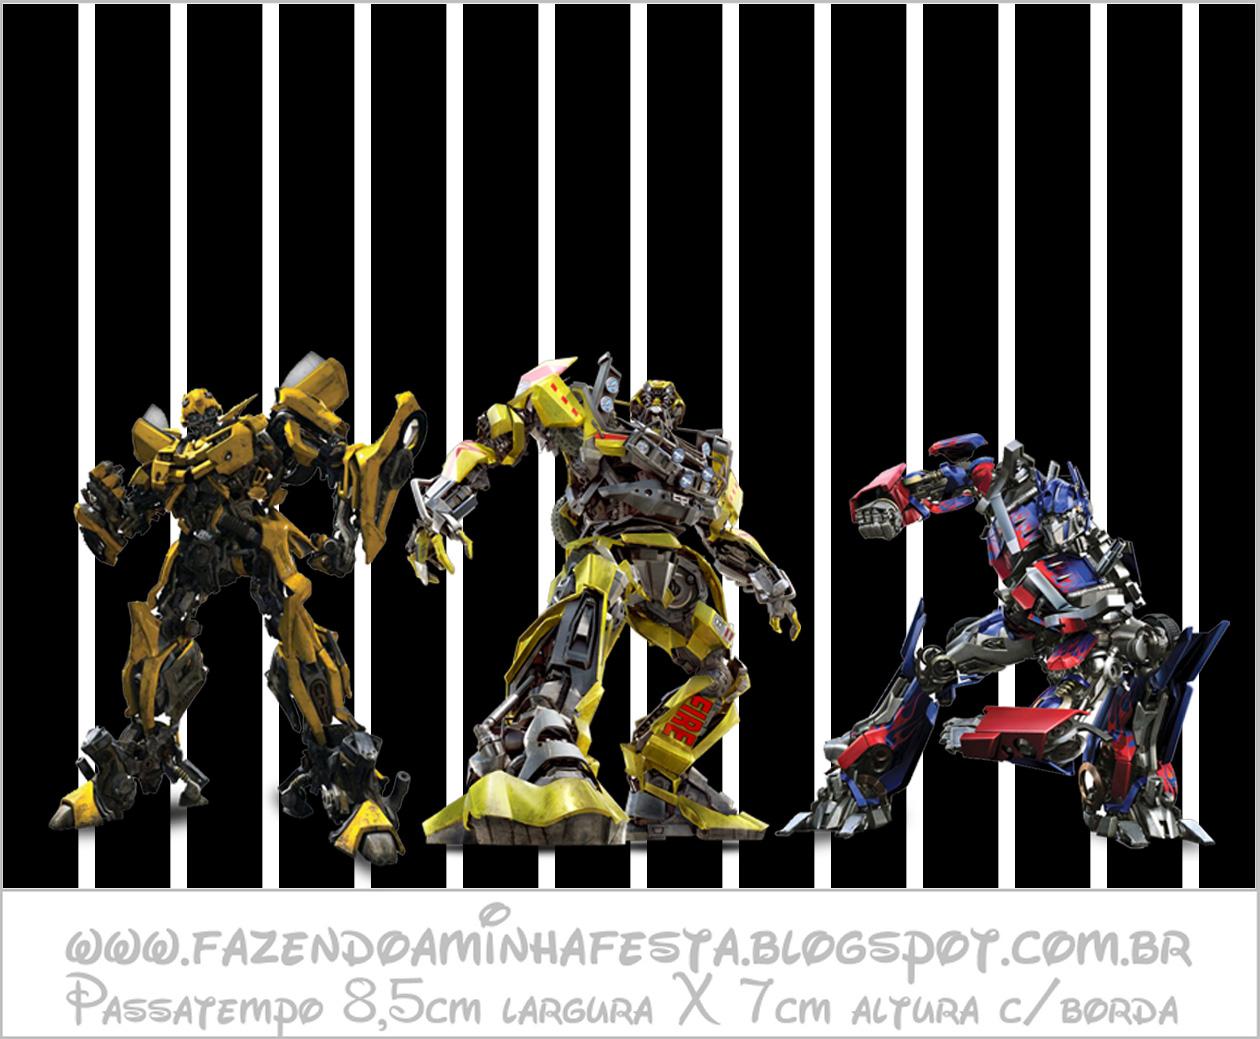 Transformers  Kit Completo com molduras para convites, rótulos para